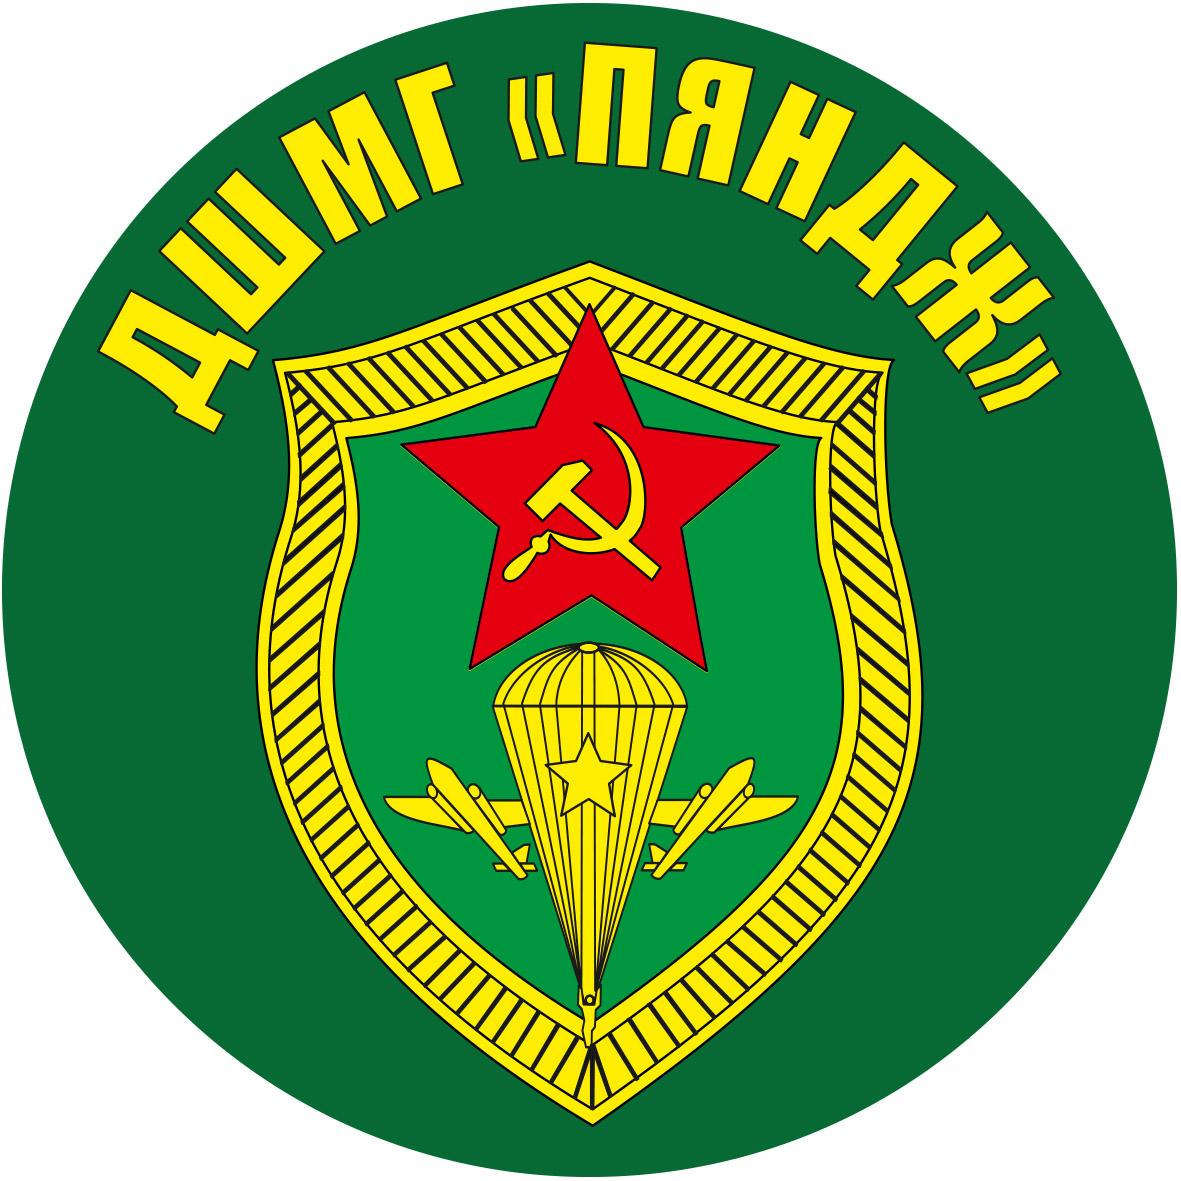 Наклейка Пянджская ДШМГ